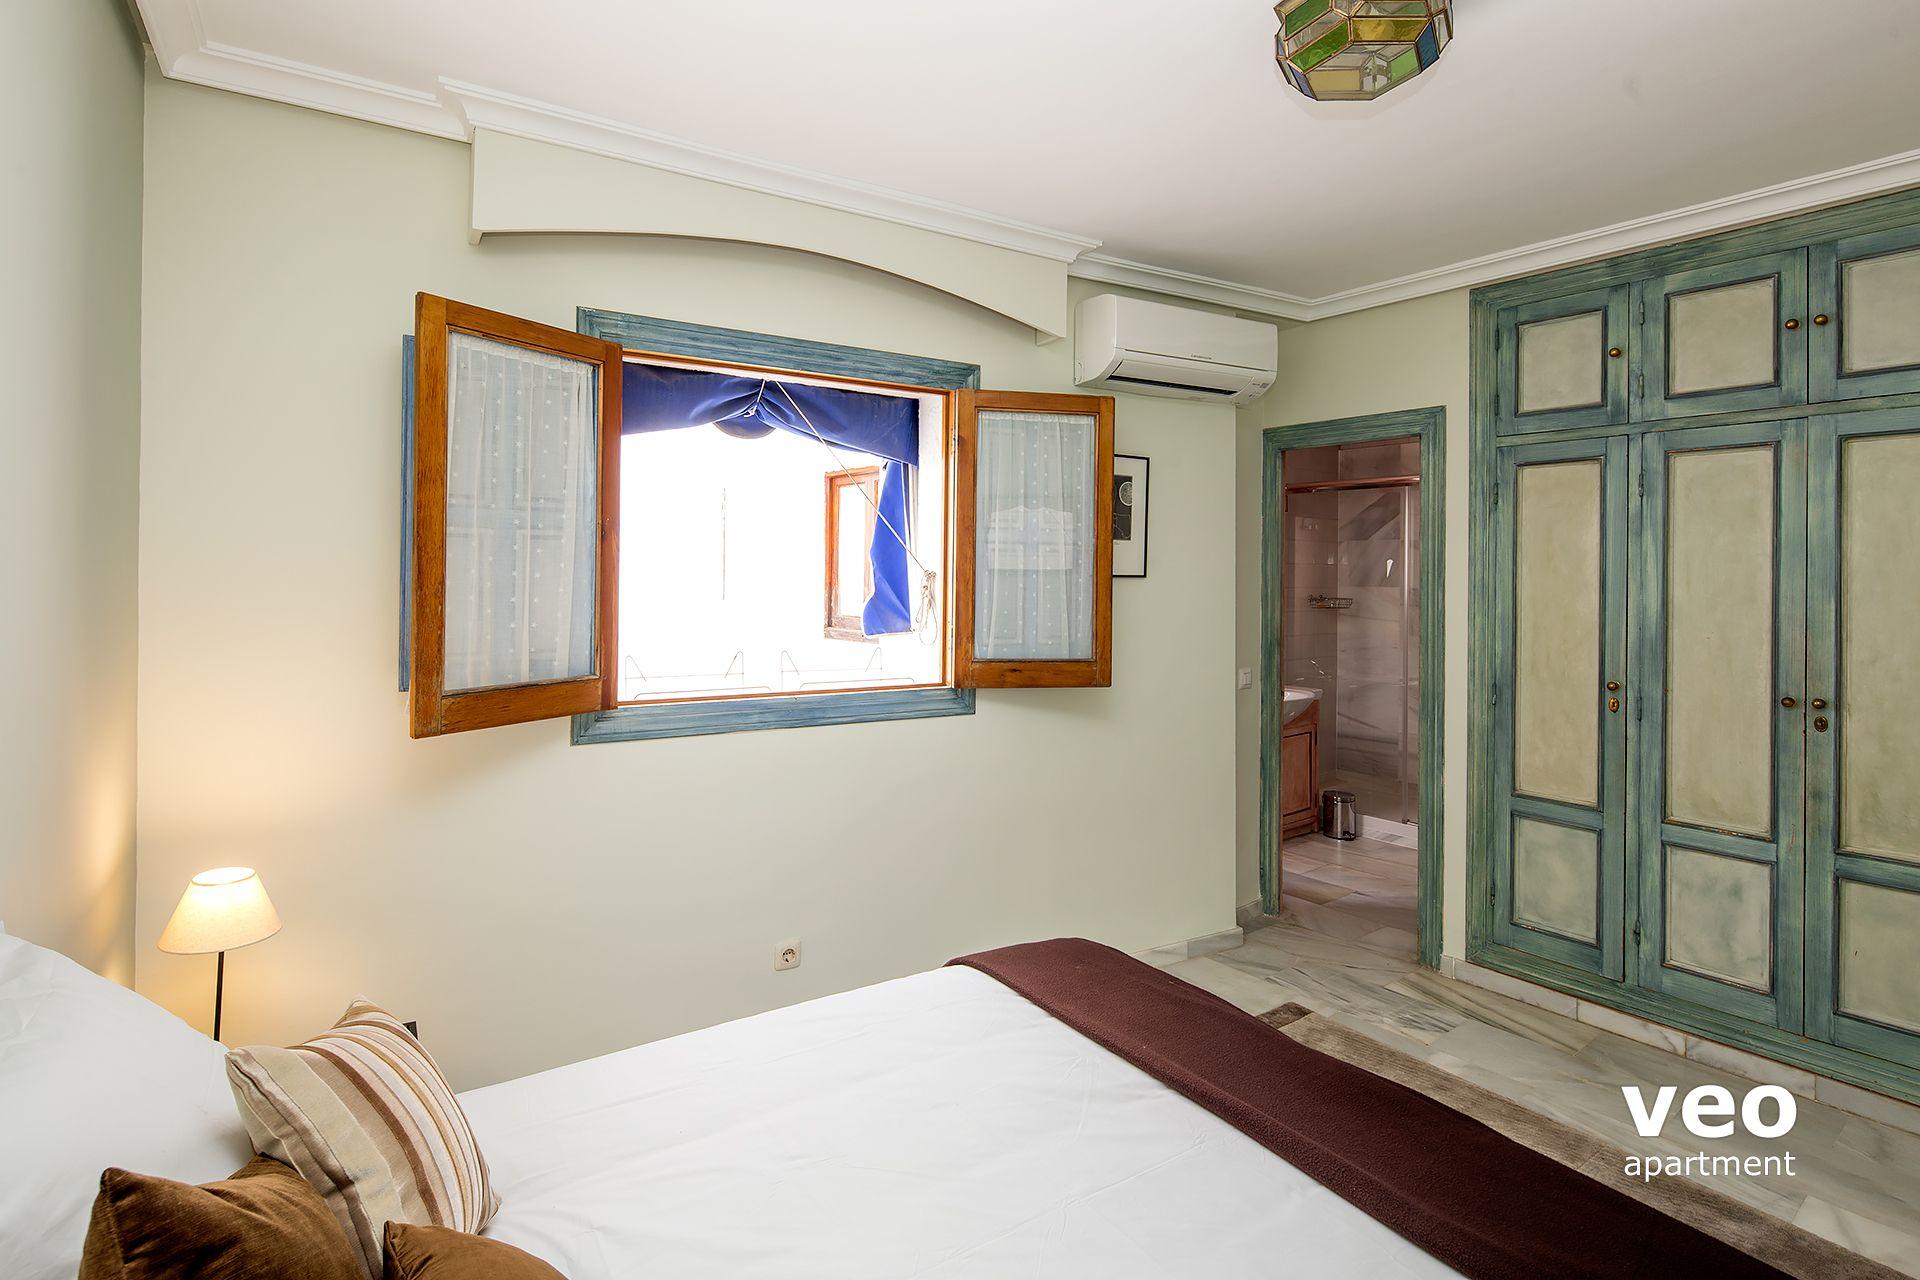 Ensuite Bathroom No Window seville apartment celinda callejón seville spain | alfalfa terrace